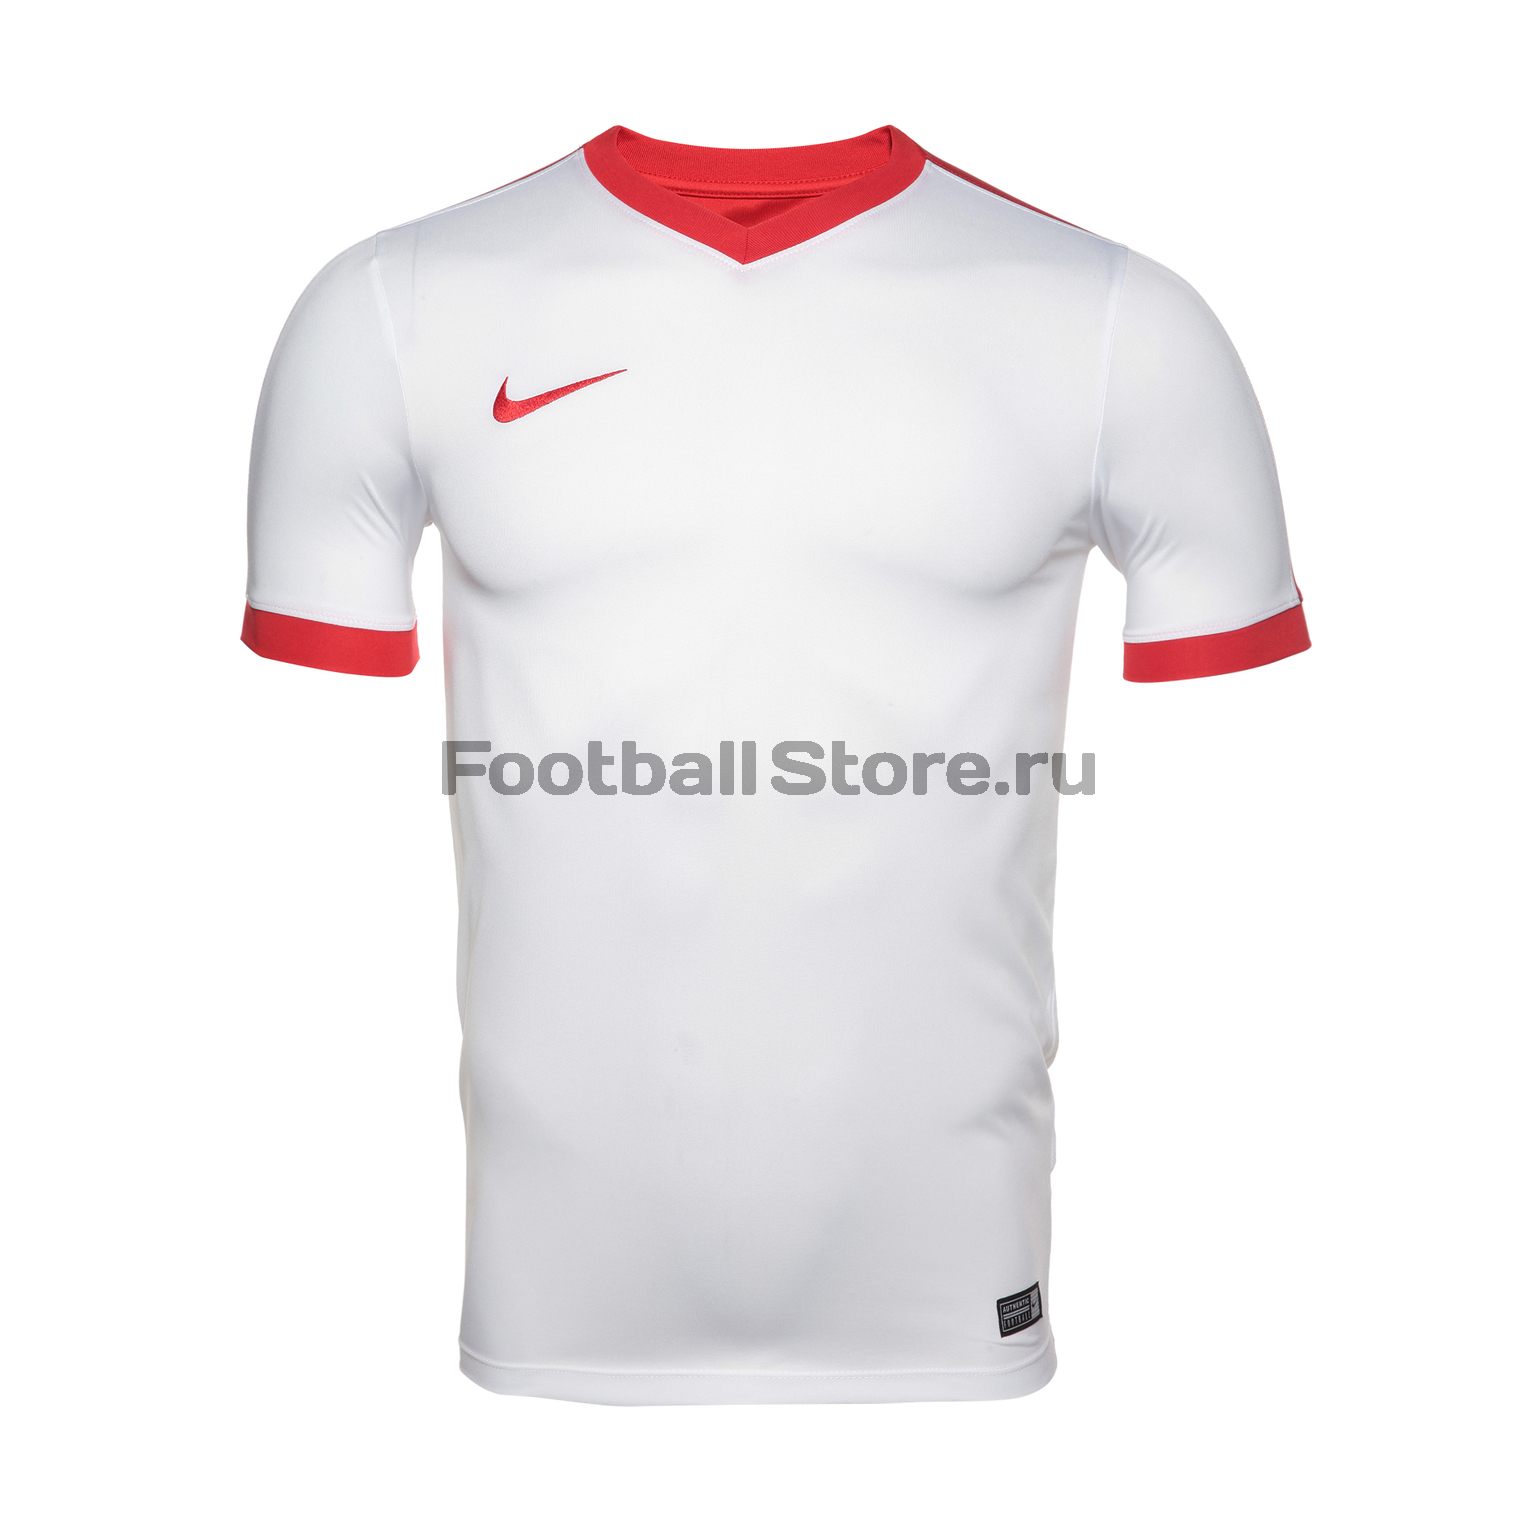 Футболки Nike Футболка Nike SS Striker IV JSY 725892-101 футболки nike футболка nike ss striker iv jsy 725892 815